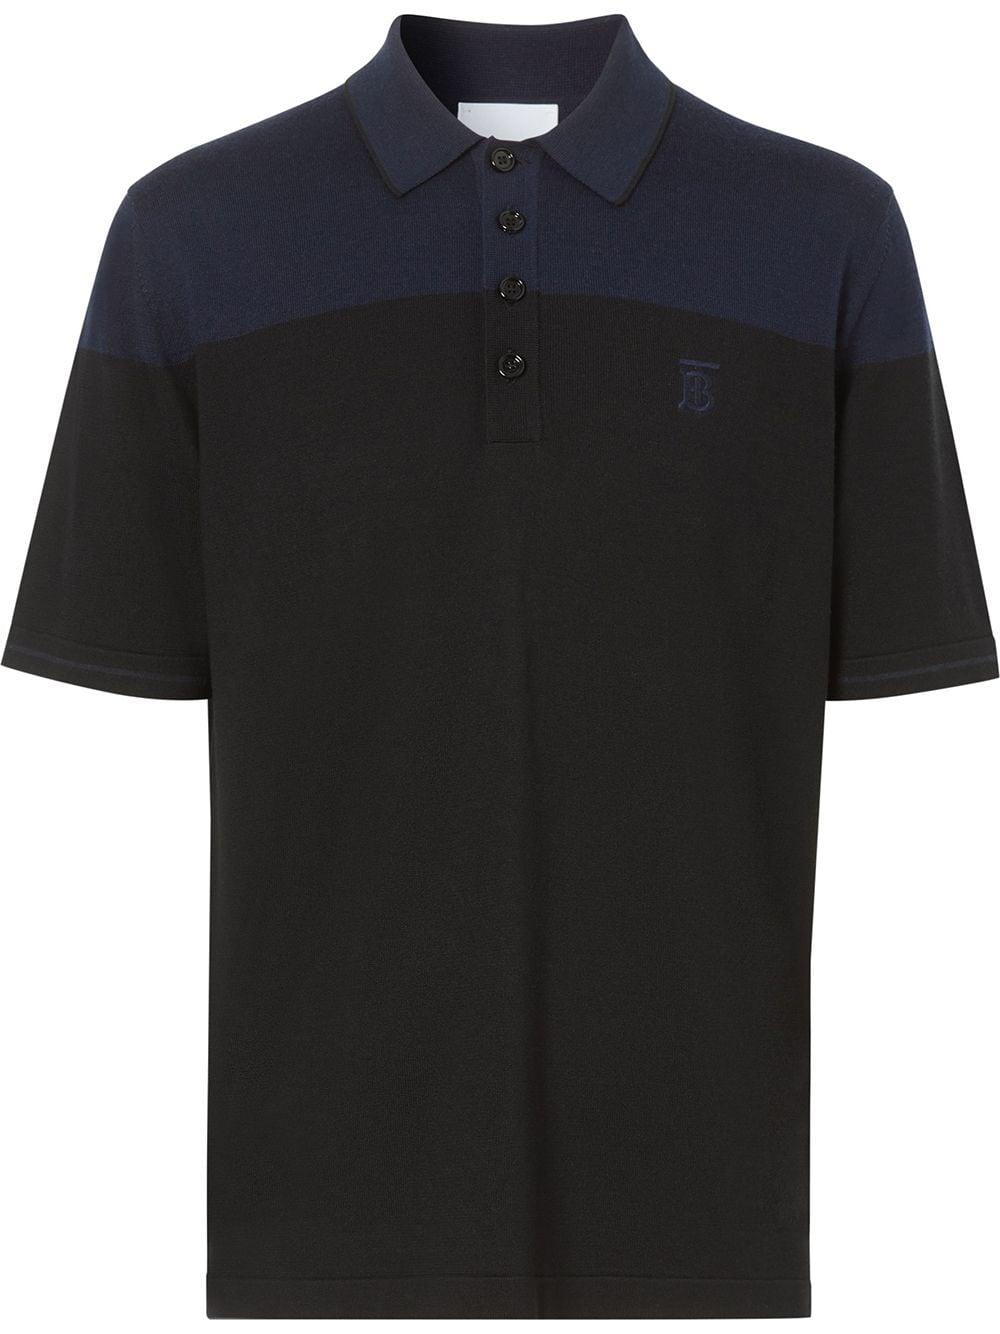 Burberry Zweifarbiges Poloshirt - Schwarz